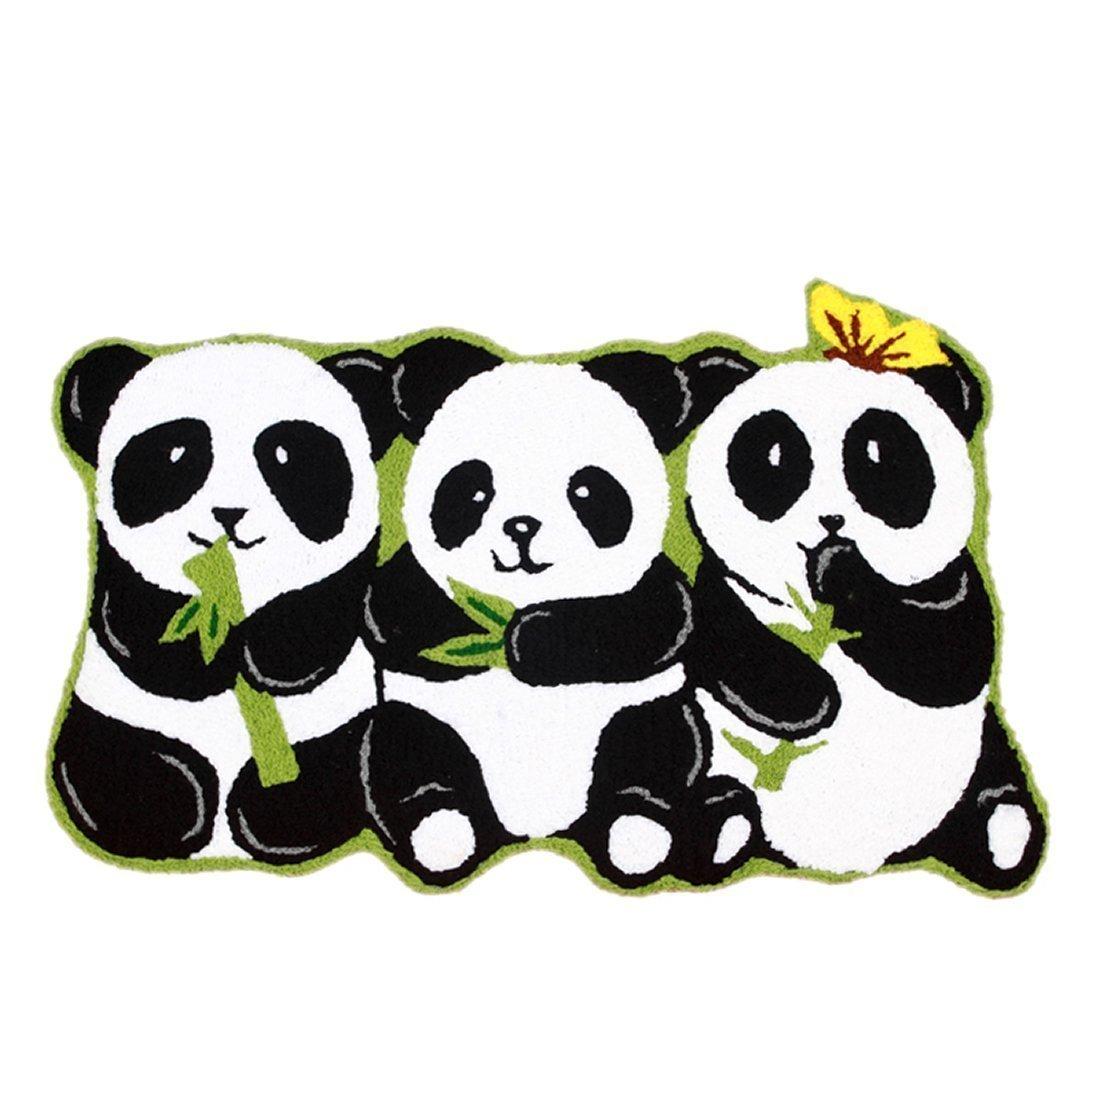 Ustide 3 Pandas Rug Handmade Rugs Non-slip Floor Mats for Bathroom Animal Rug for Kids Small, 19''x31'' by USTIDE